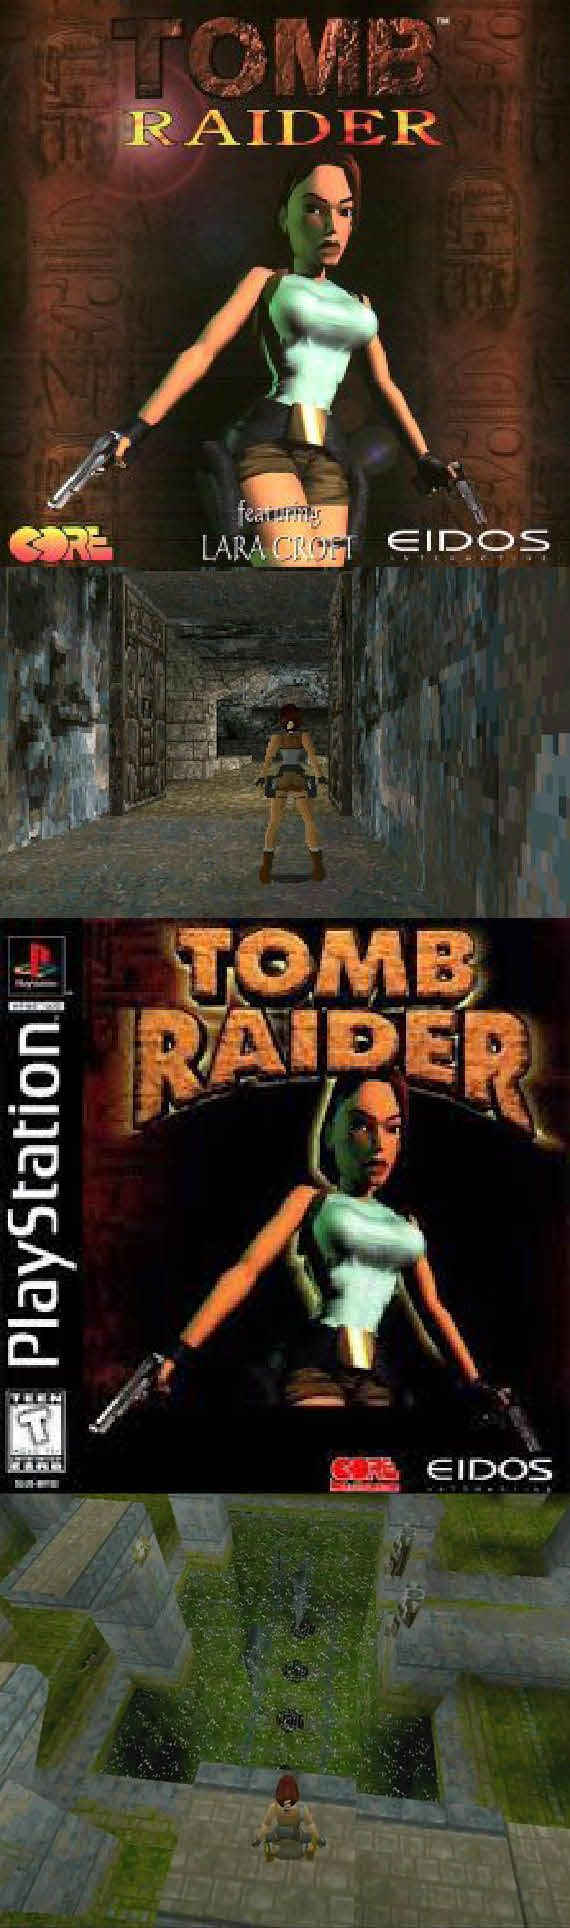 #TombRaider #LaraCrofts first adventure is still worth playing! #RetroGamer #PlayStation, #SegaSaturn http://www.levelgamingground.com/original-tomb-raider-review.html